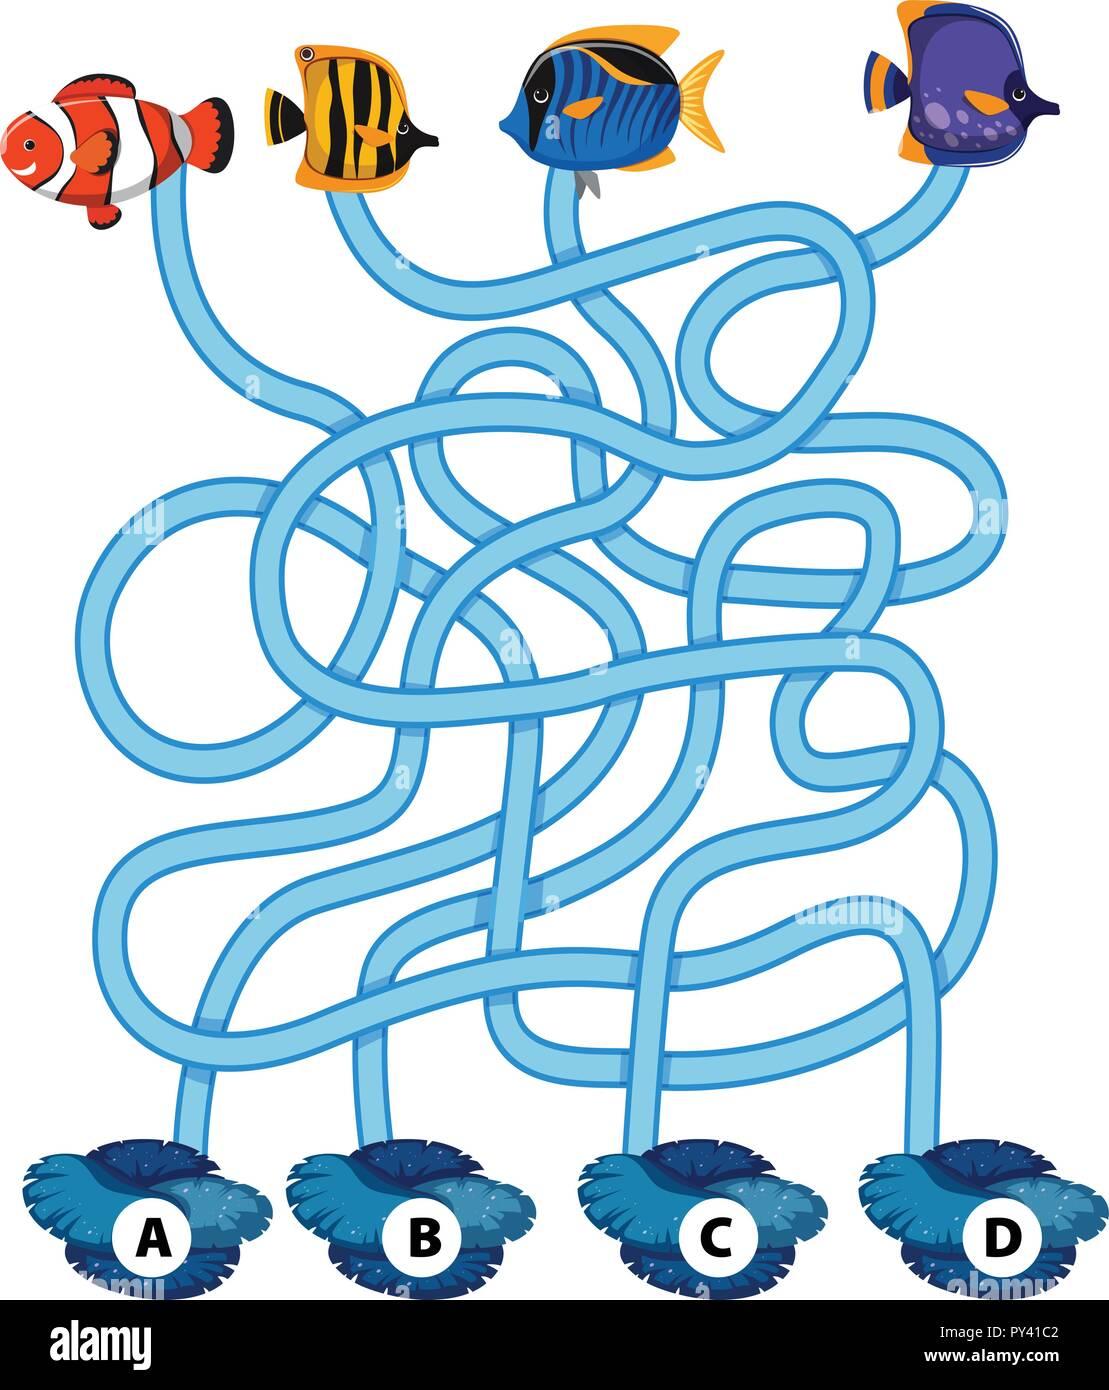 Fish Maze Puzzle Game Illustration Stock Vector Art Illustration